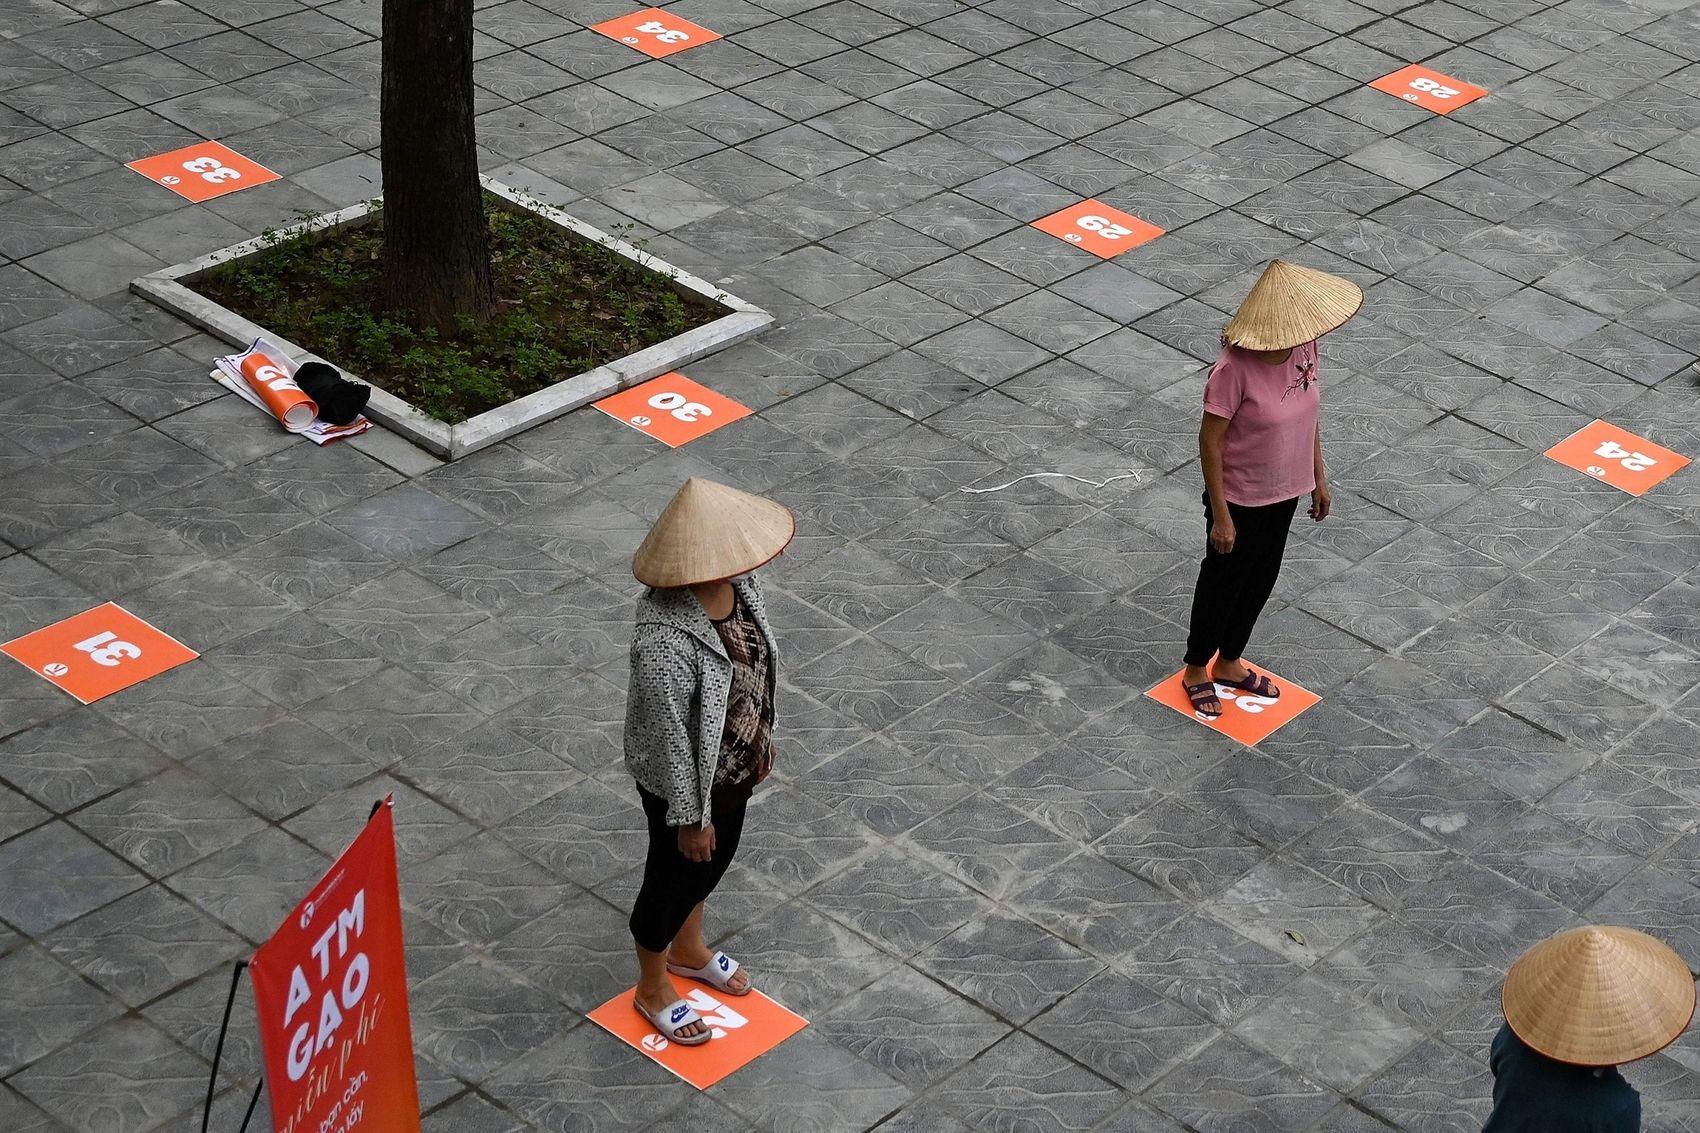 social-distancing-vietnam-hanoi-ho-chi-minh-city